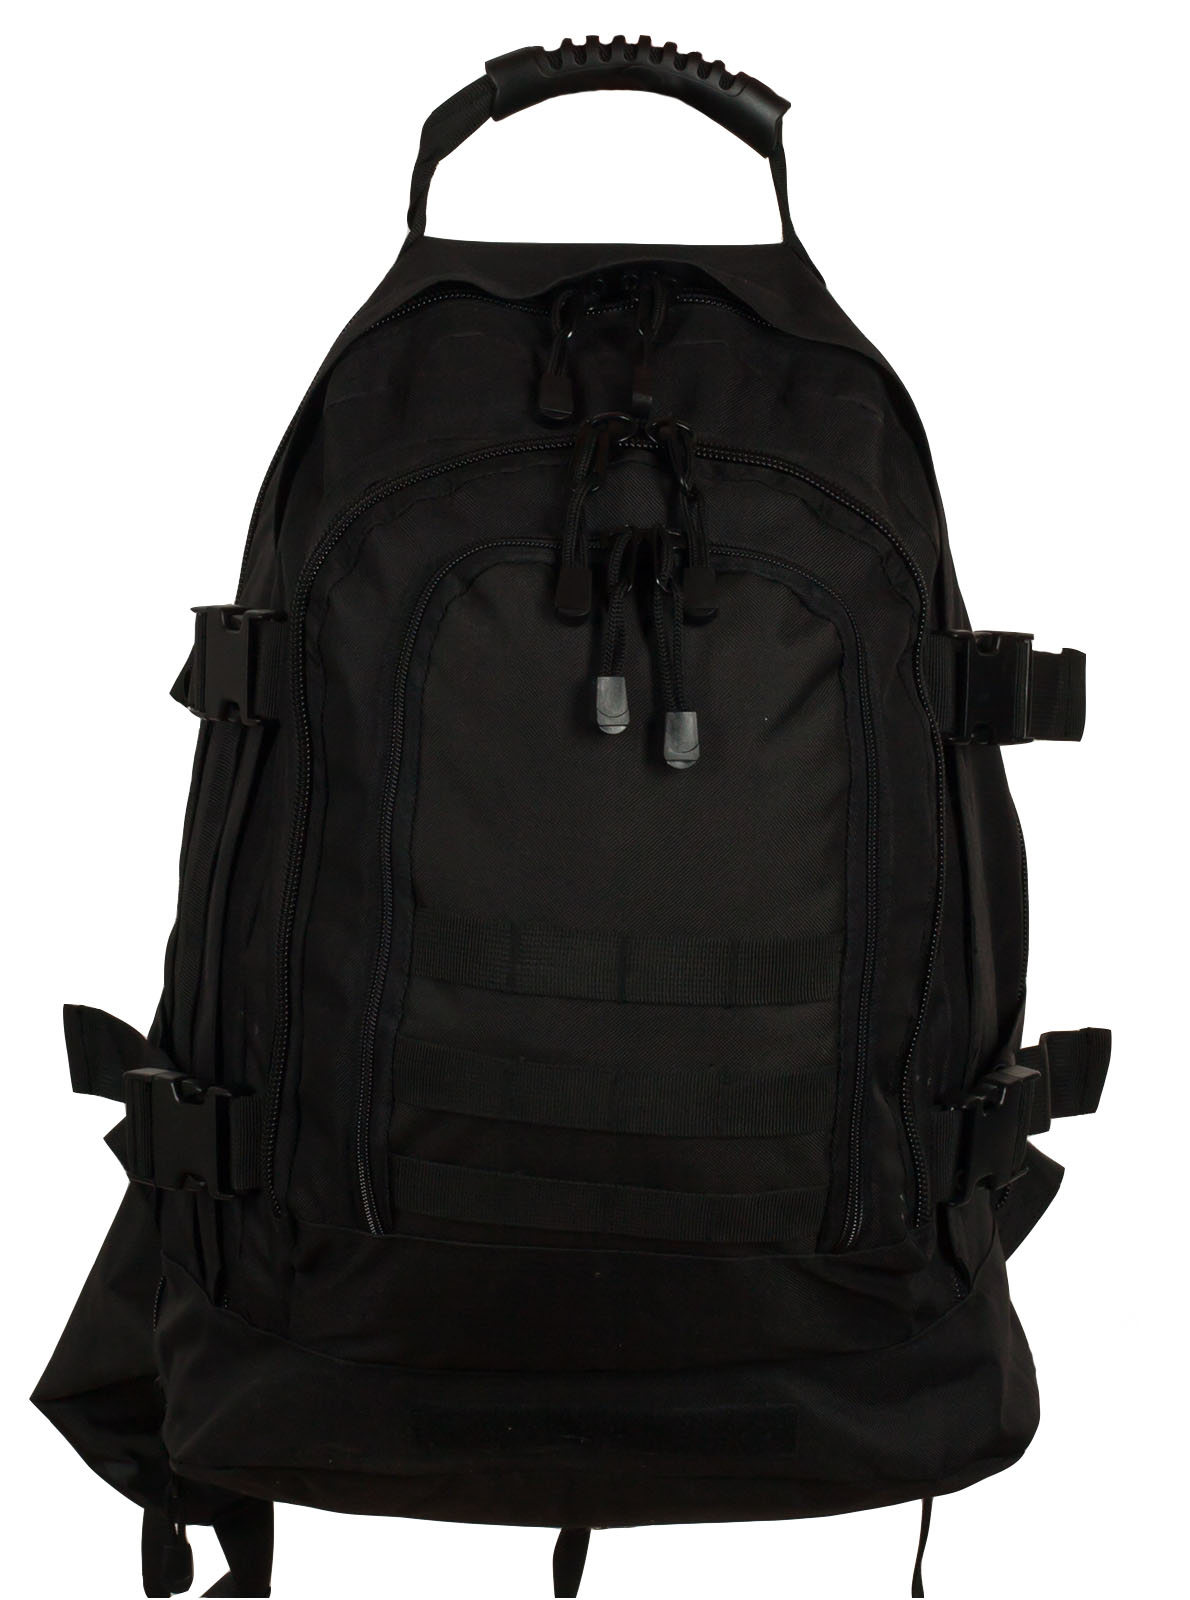 Черный армейский рюкзак 3-Day Expandable Backpack 08002A Black в военторге Военпро